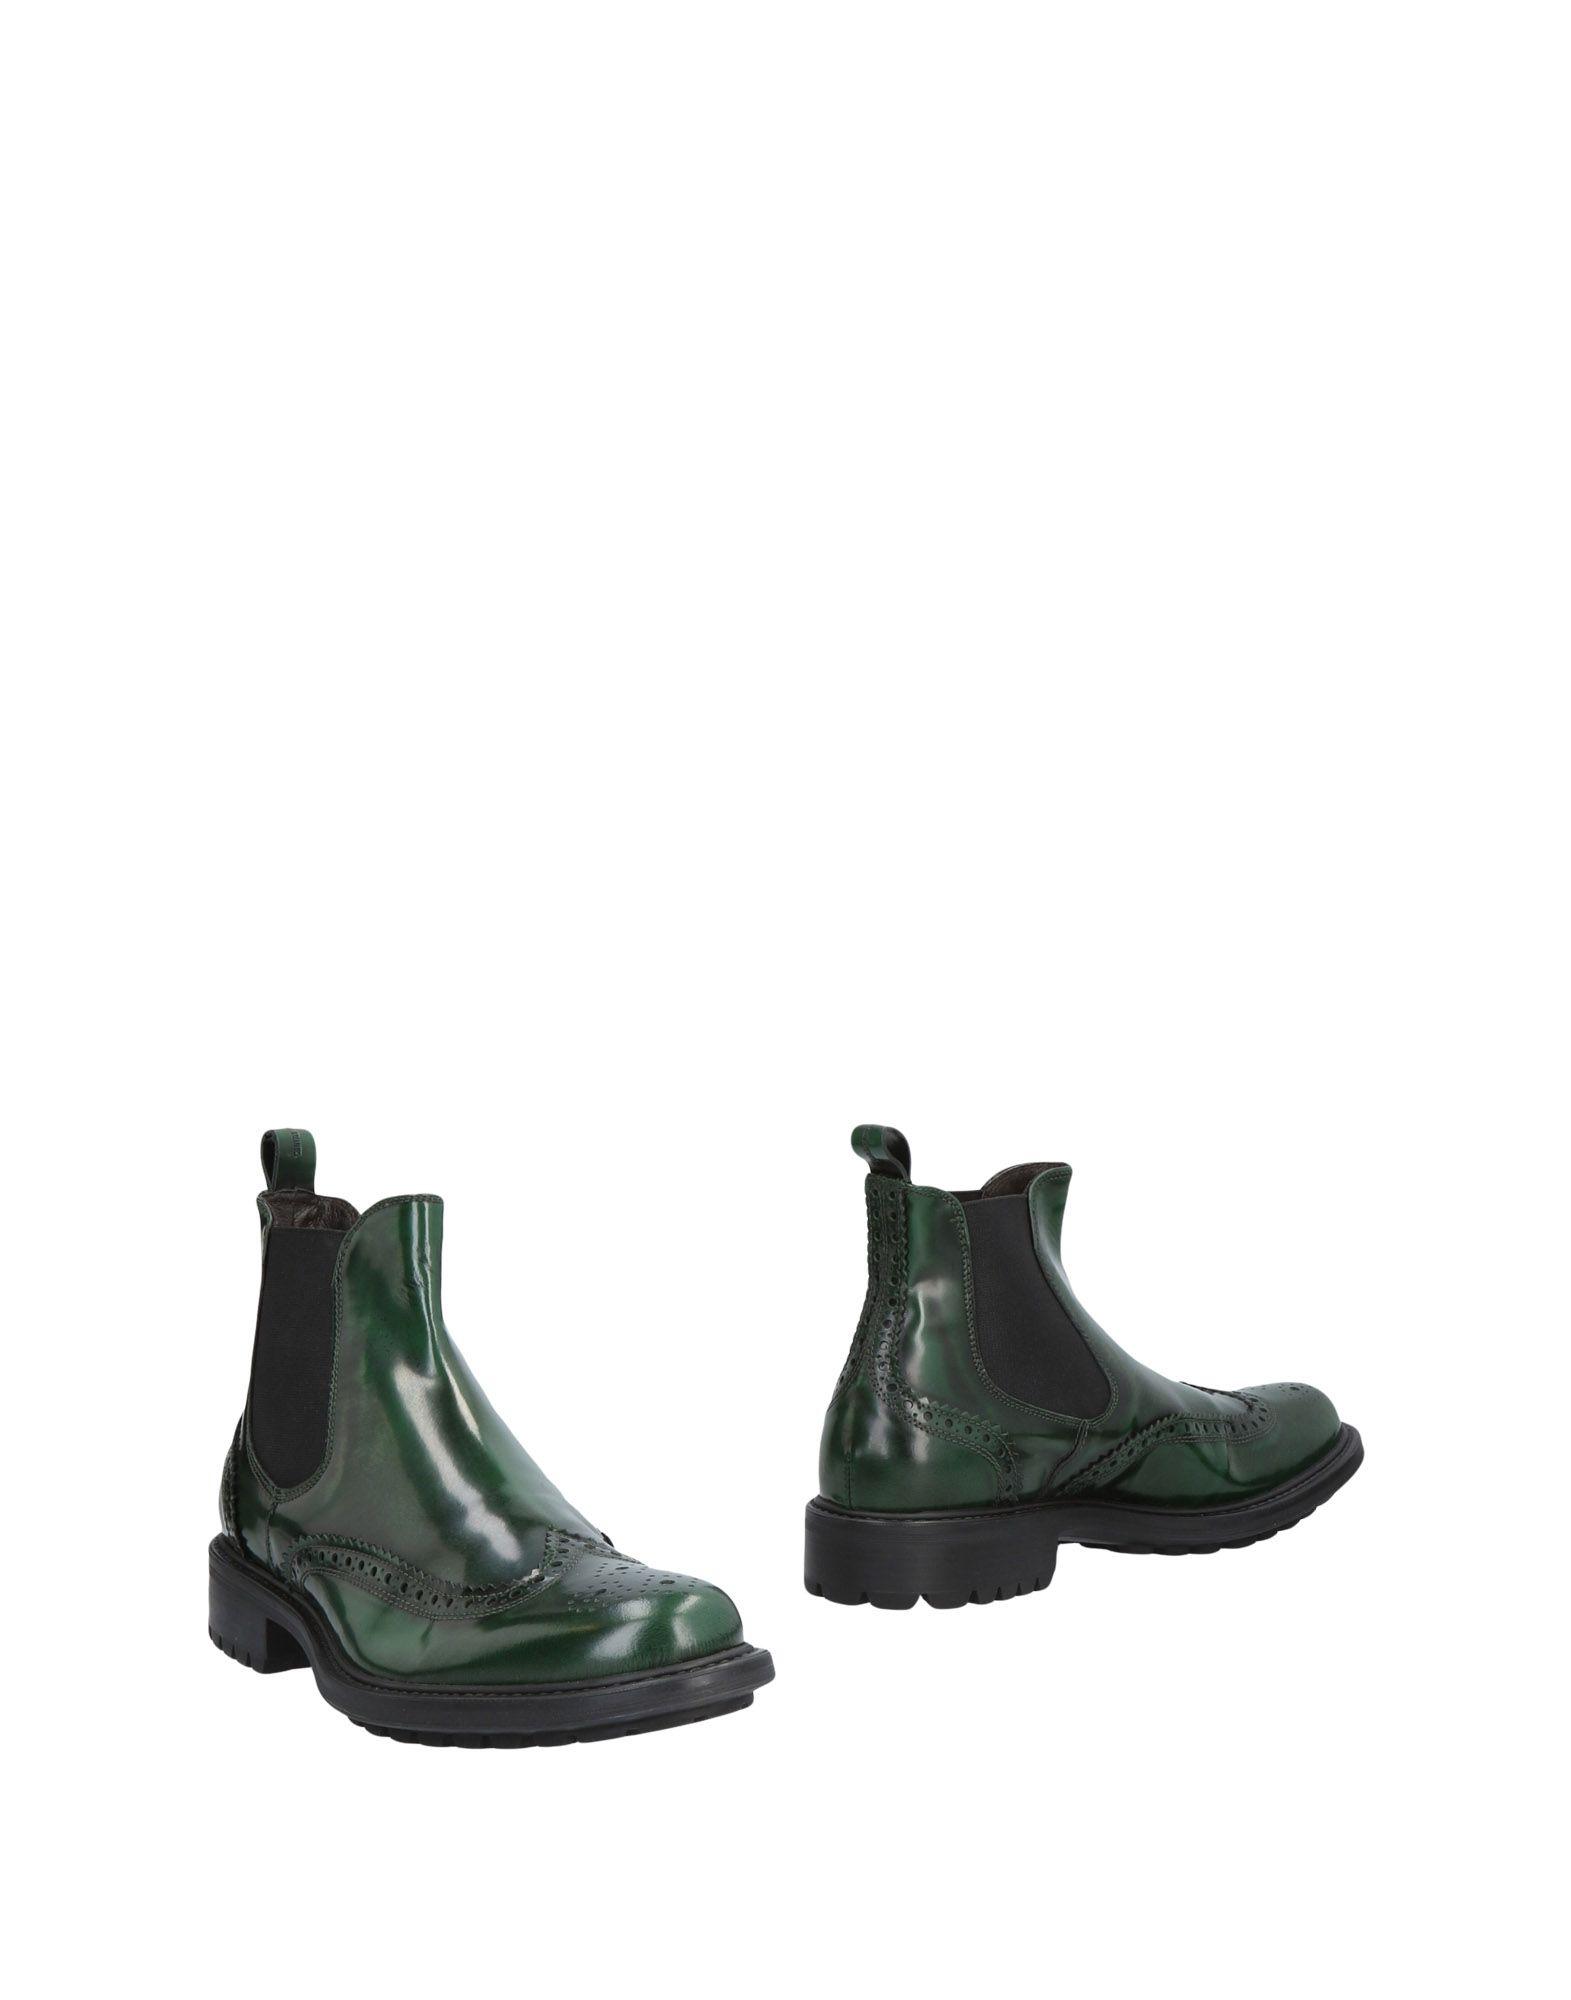 Rabatt Stiefelette echte Schuhe Manuel Ritz Stiefelette Rabatt Herren  11318147UL 95fc8e